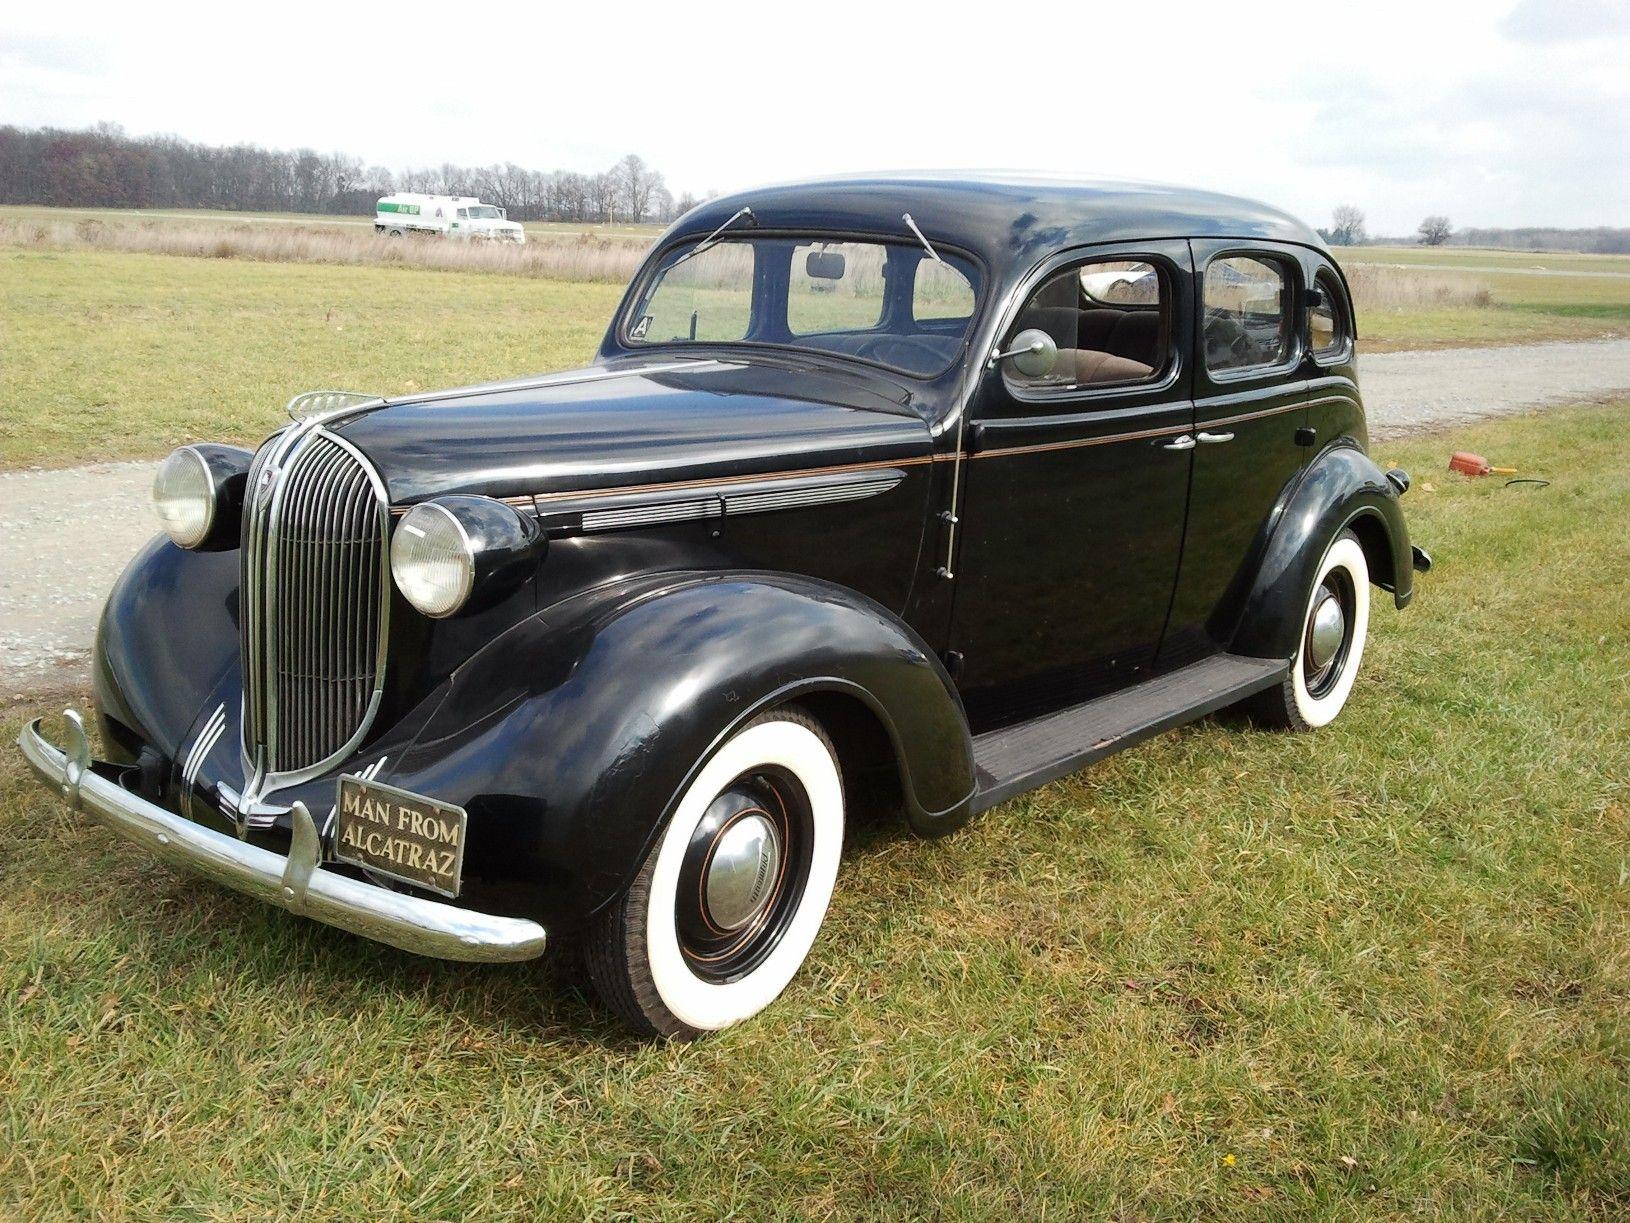 1937 plymouth sedan 1937 plymouth touring sedan by for 1937 plymouth 4 door sedan